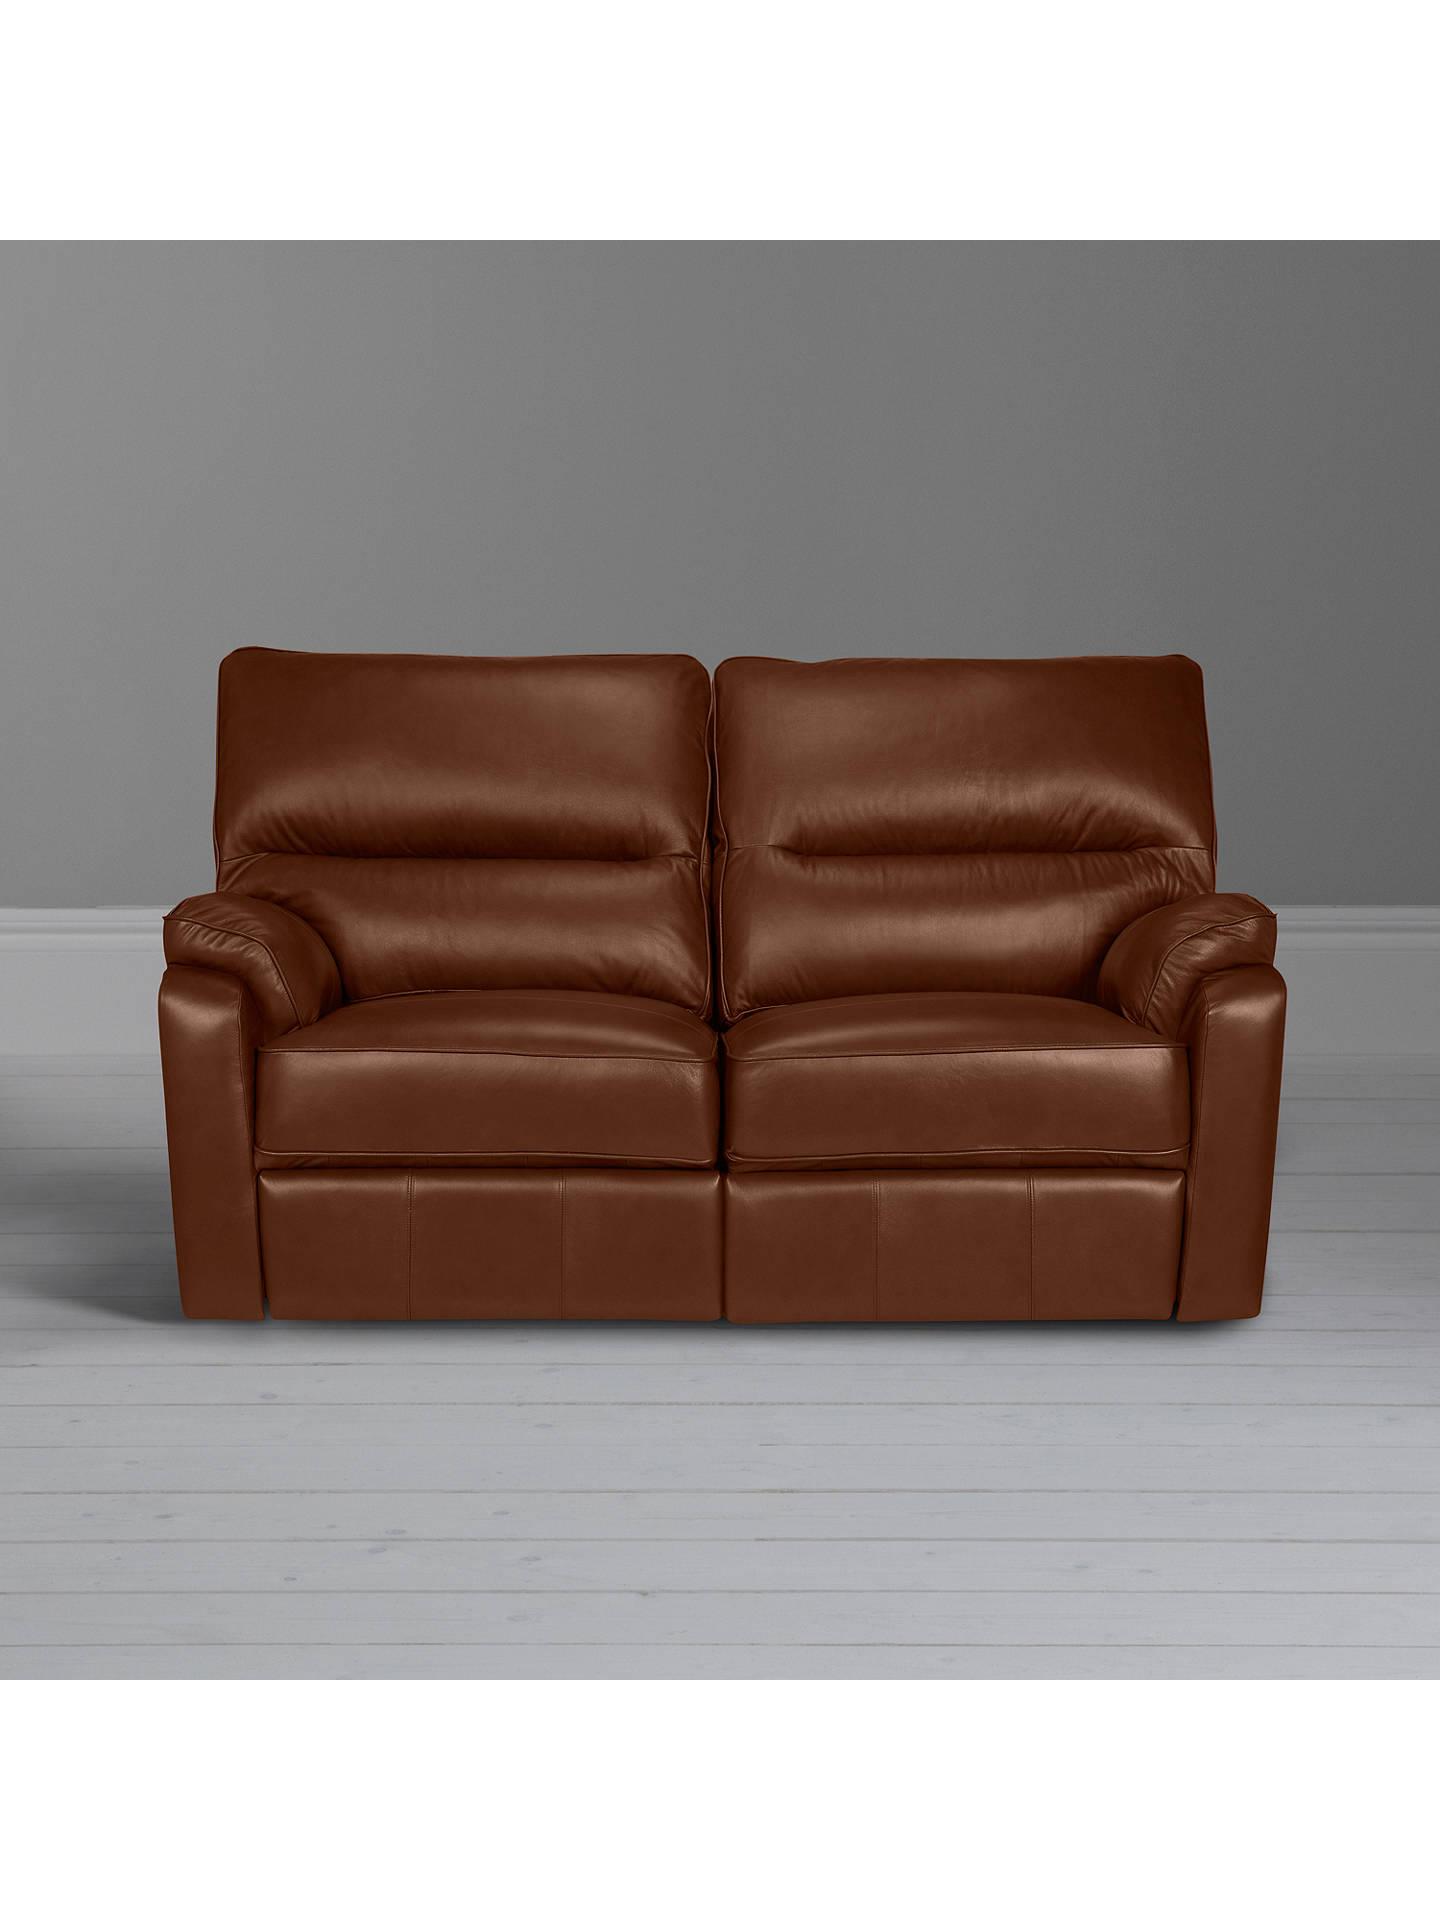 John Lewis & Partners Carlisle Small 2 Seater Power Recliner Leather Sofa,  Contempo Castanga